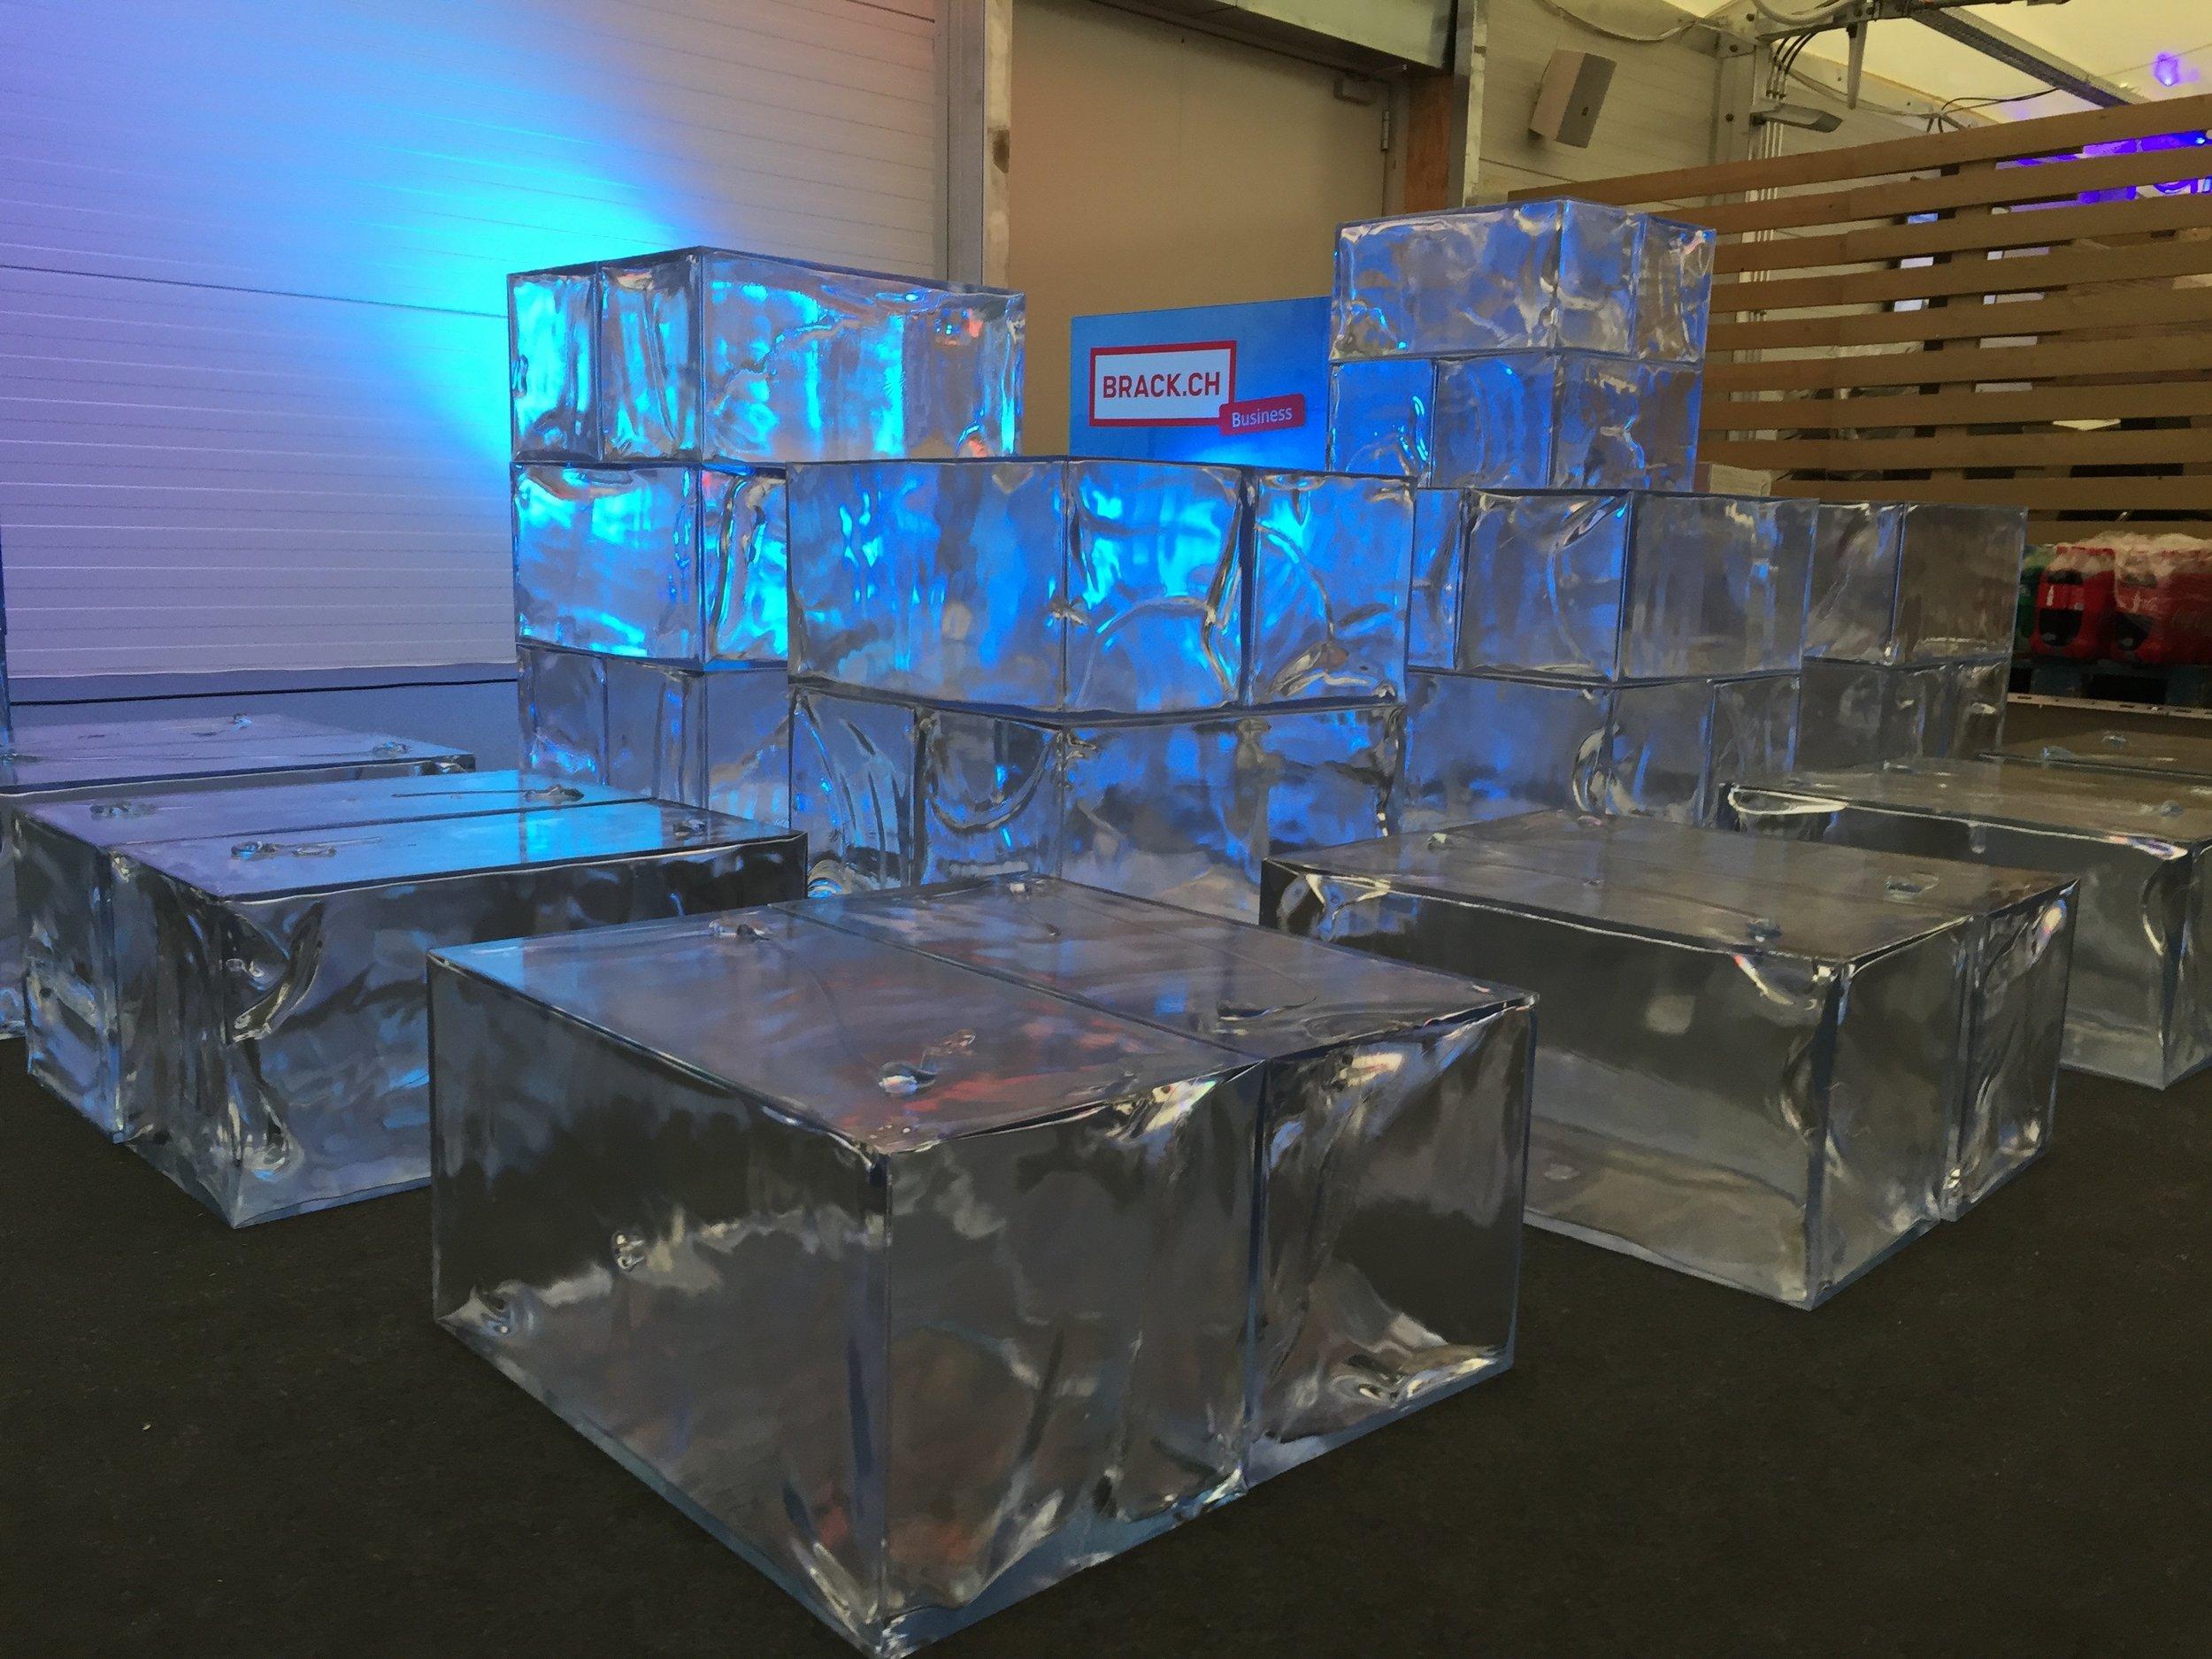 PENGland_Verkauf BRACK IceLounge BRACK.CH Lausanne 3.jpg